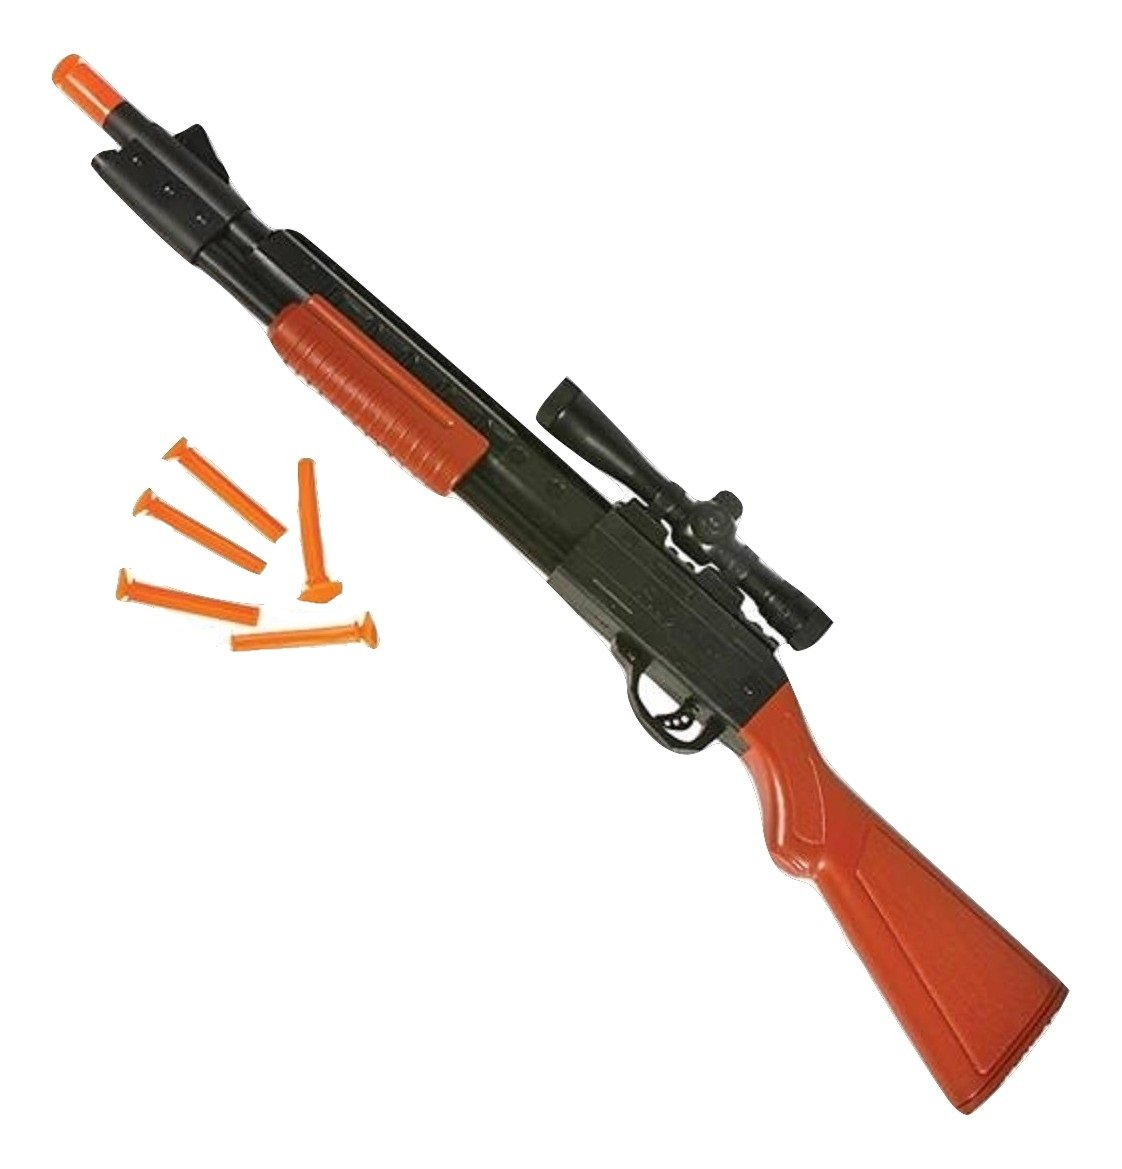 Nicky Bigs Novelties 23 Pump Action Dart Suction Cup Rifle Western Cowboy Toy Shotgun Gun Rhode Island